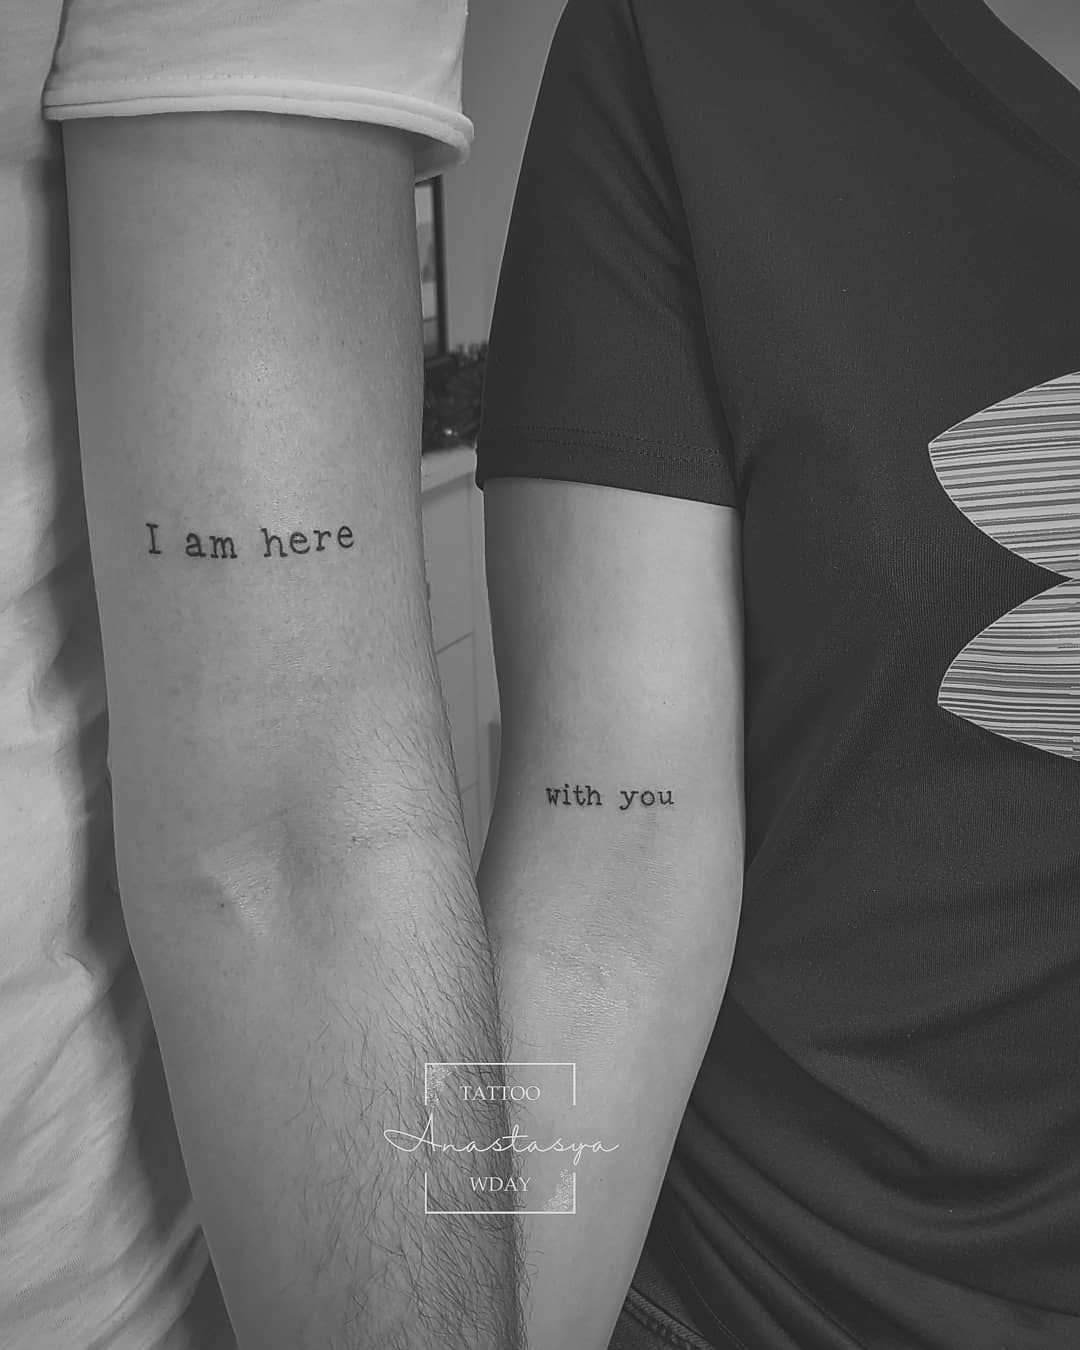 Ideen partner tattoo 50 Partner